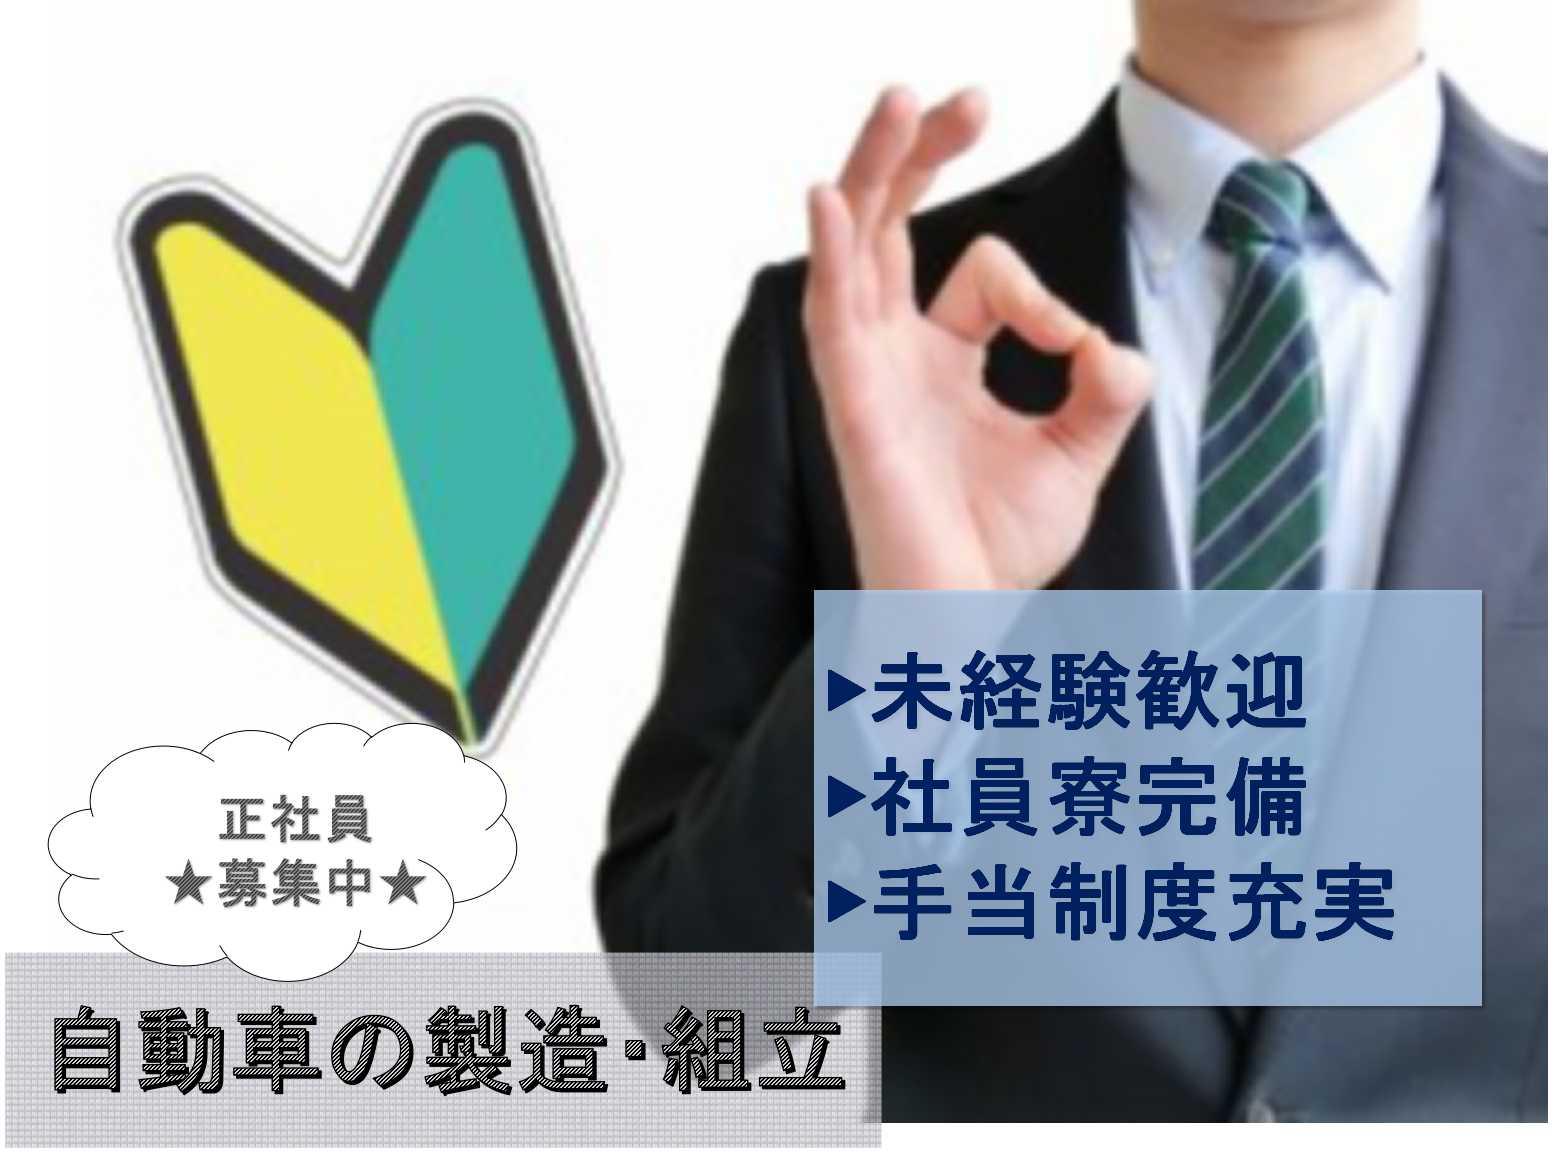 【正社員】未経験歓迎◆社員寮完備◆自動車の製造・組立◆ イメージ